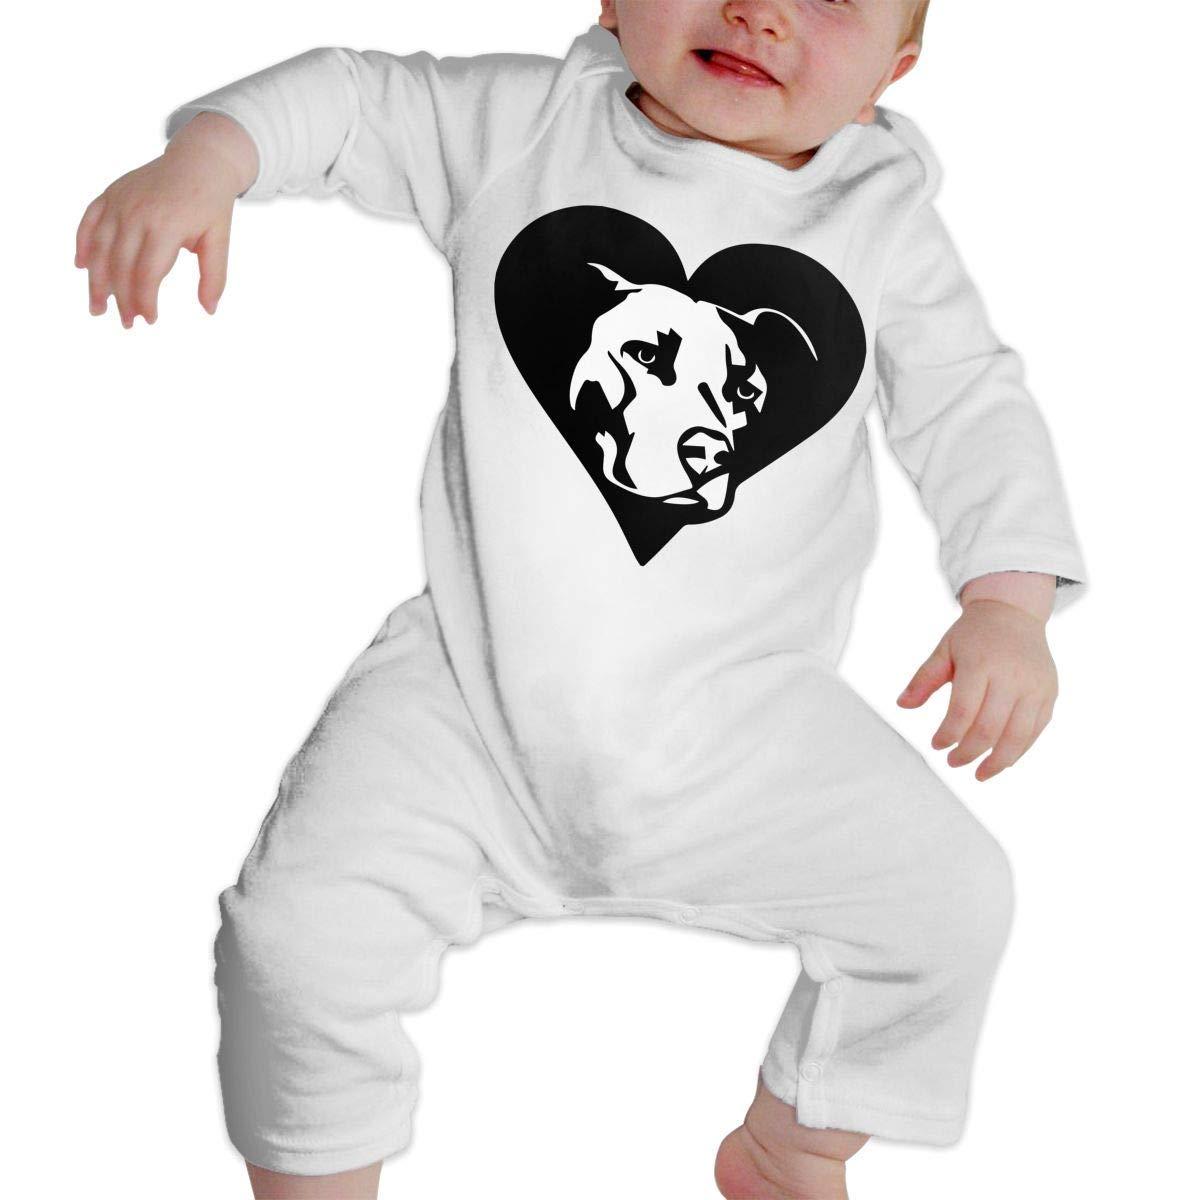 TYLER DEAN Baby Boy Jumpsuit Pitbull Heart2 Infant Long Sleeve Romper Jumpsuit